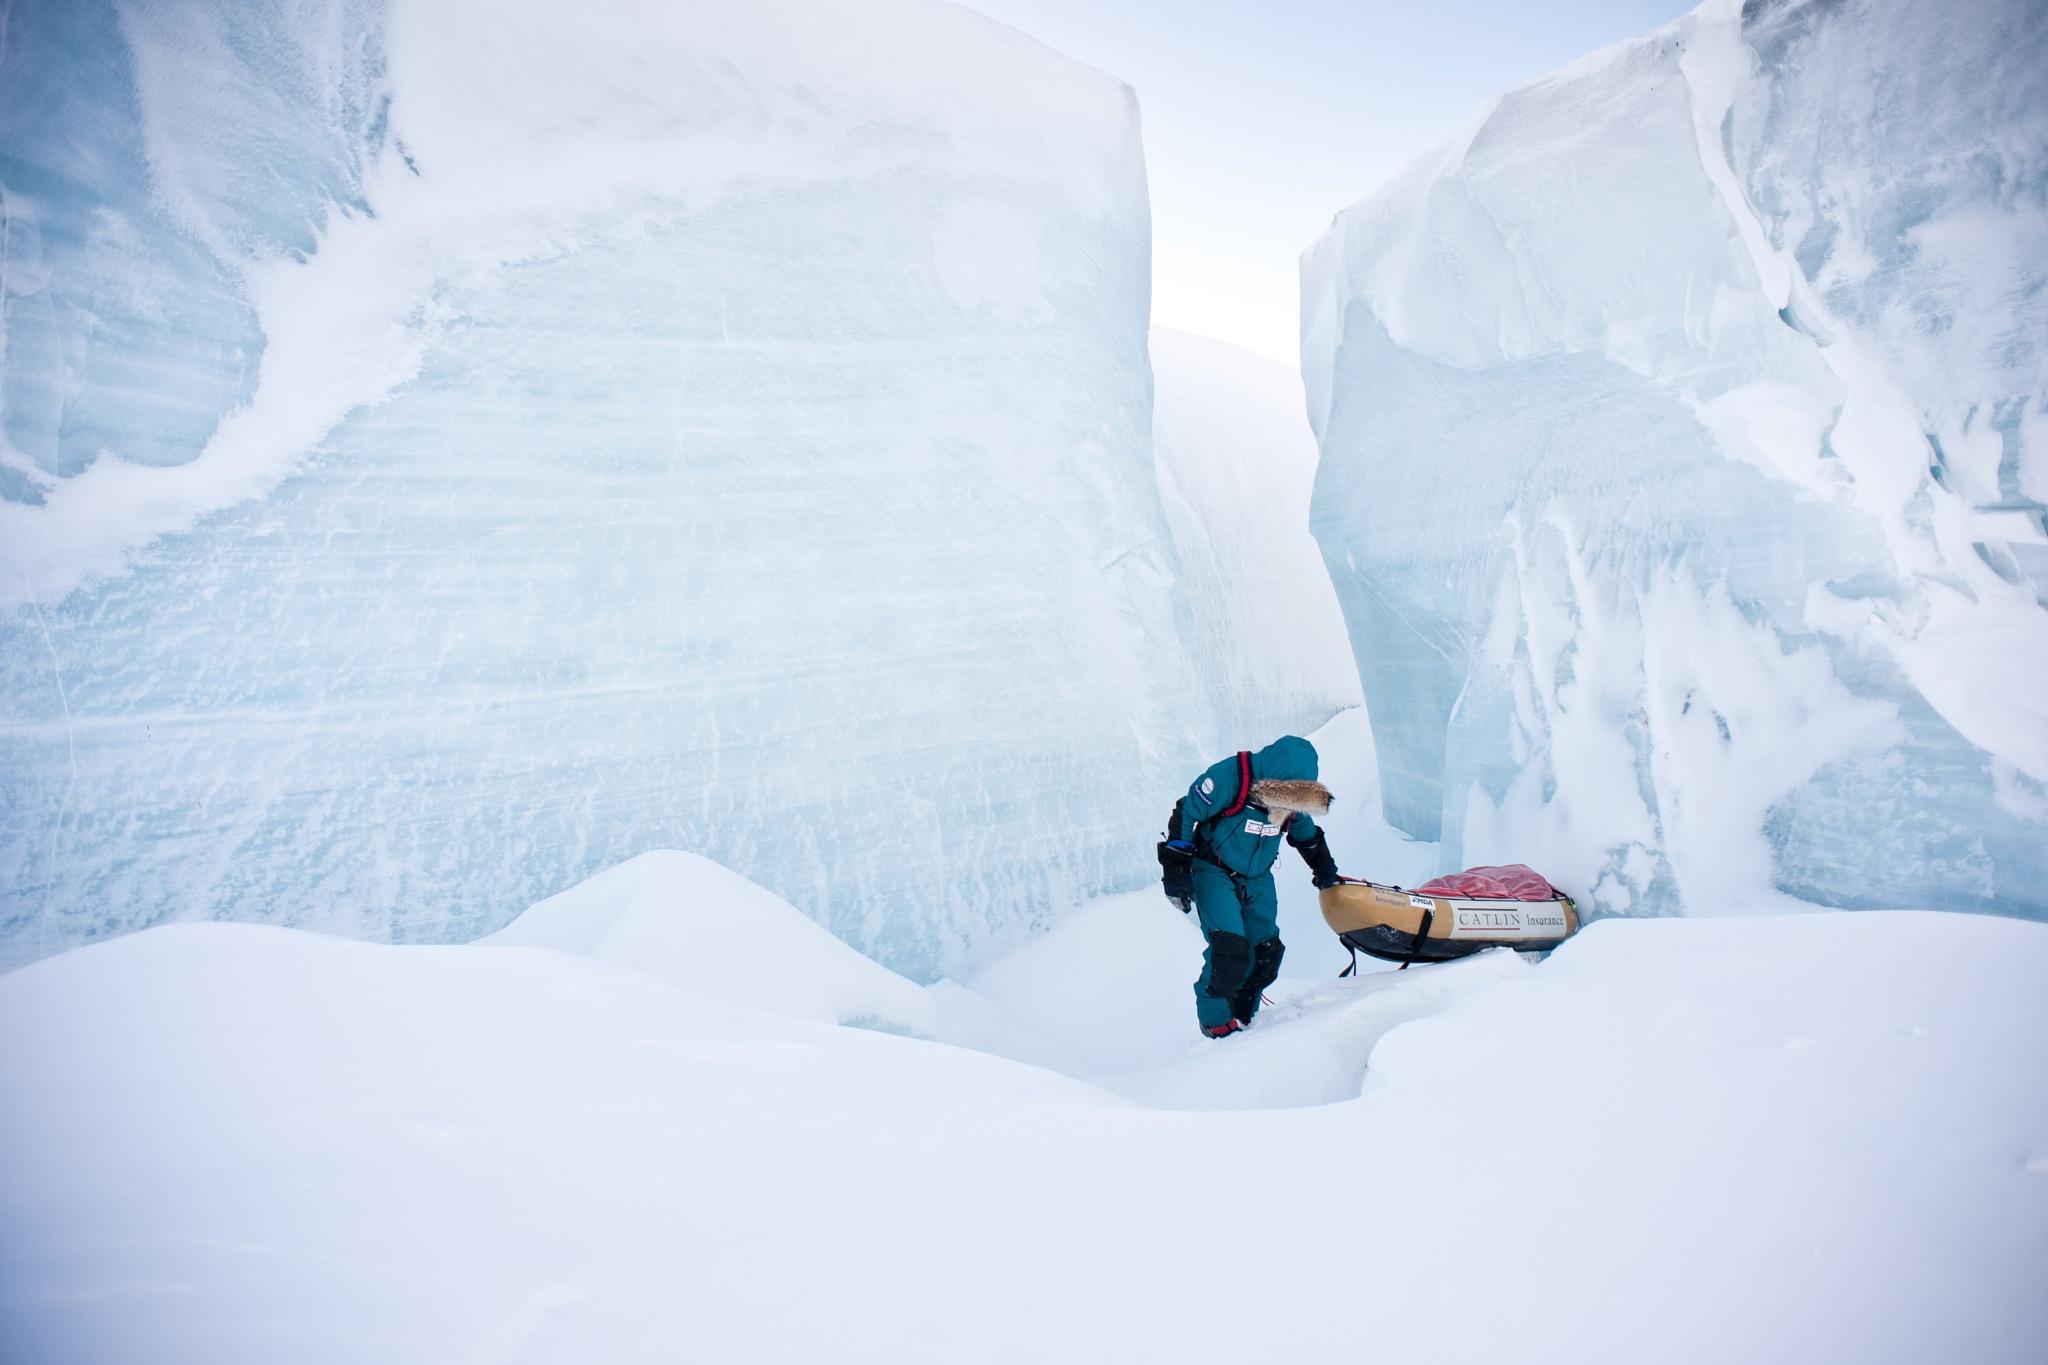 Inside an iceberg by Martin Hartley